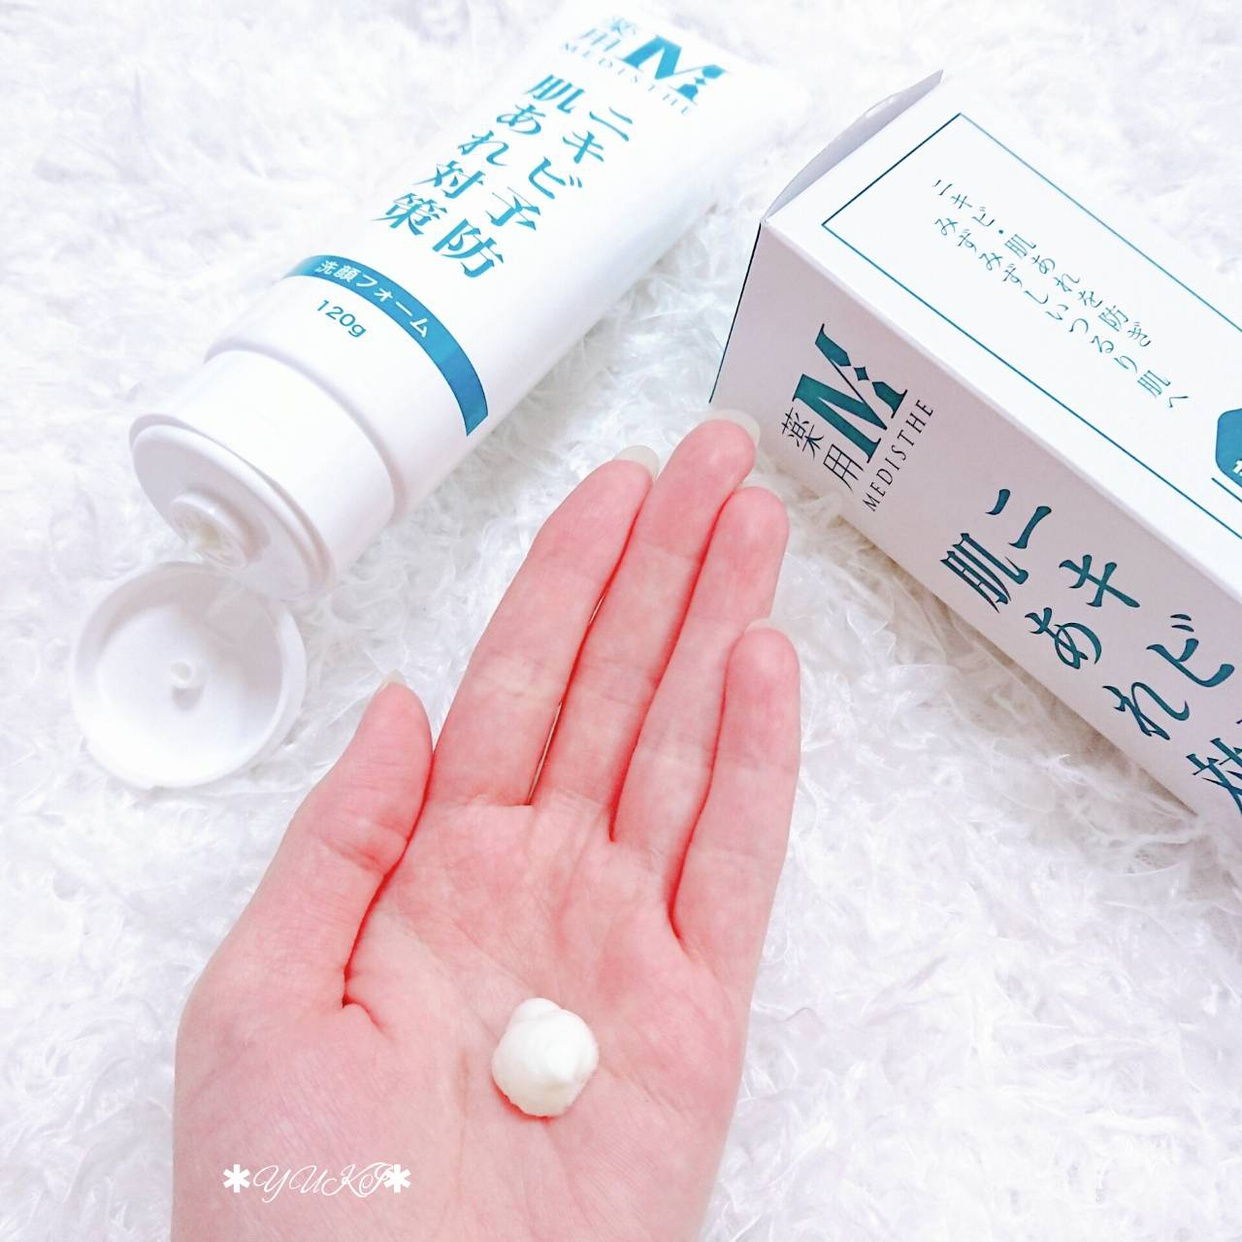 MEDISTHE(メディステ) 薬用 NI-KIBI 洗顔フォームを使ったYUKIさんのクチコミ画像2